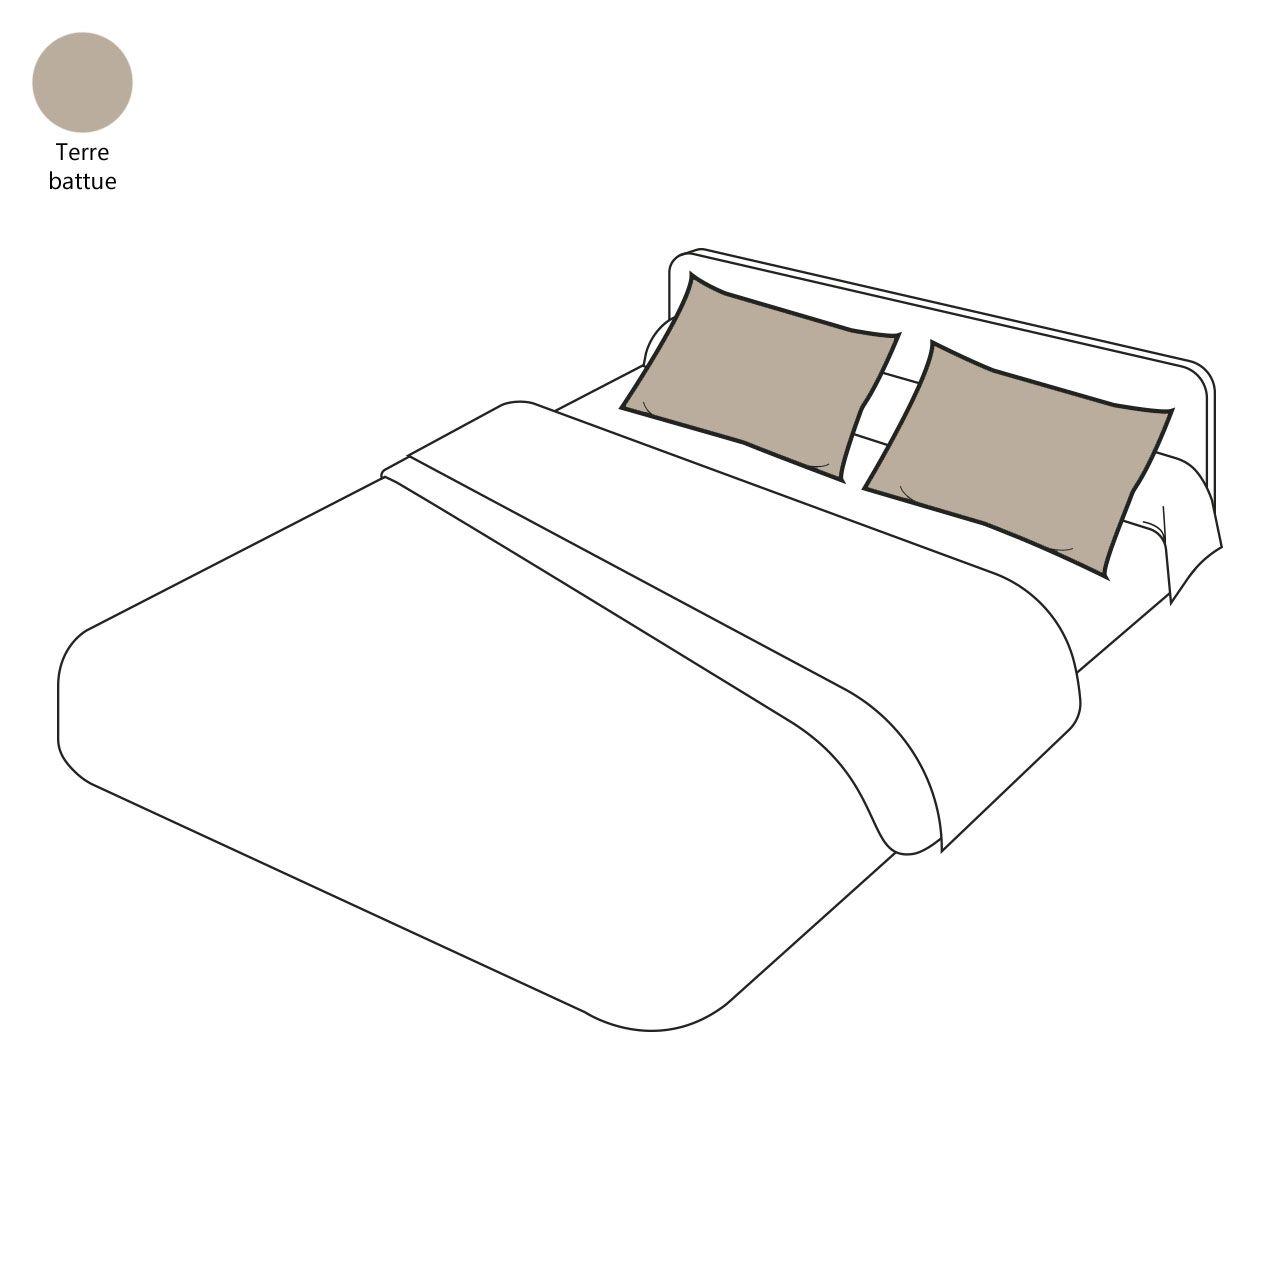 taie d 39 oreiller uni terre battue percale 40x40 sylvie thiriez. Black Bedroom Furniture Sets. Home Design Ideas